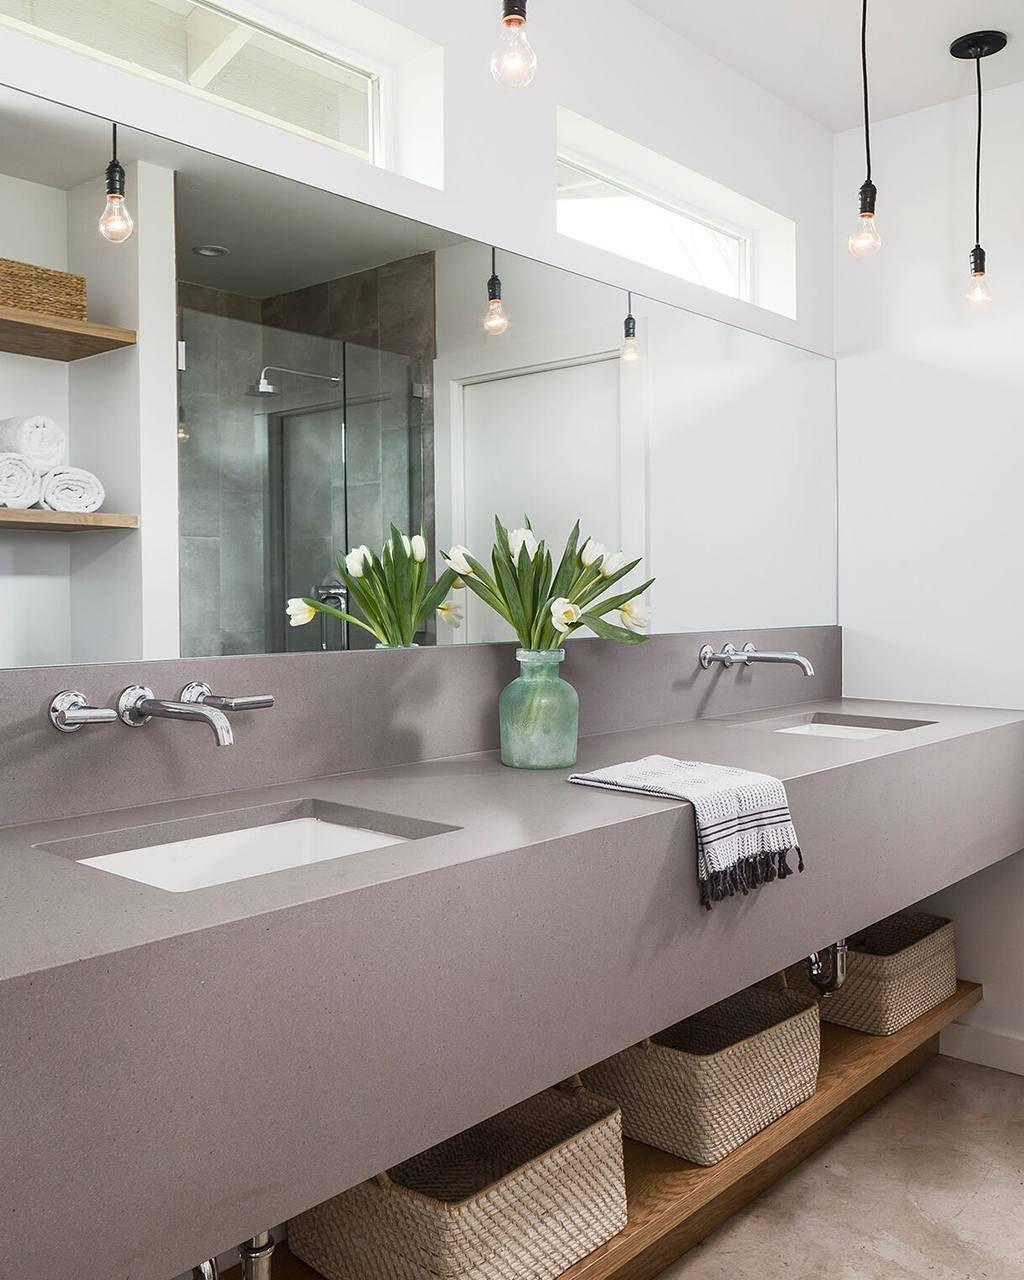 Sleek Concrete certainly looks sleek in this modern ...